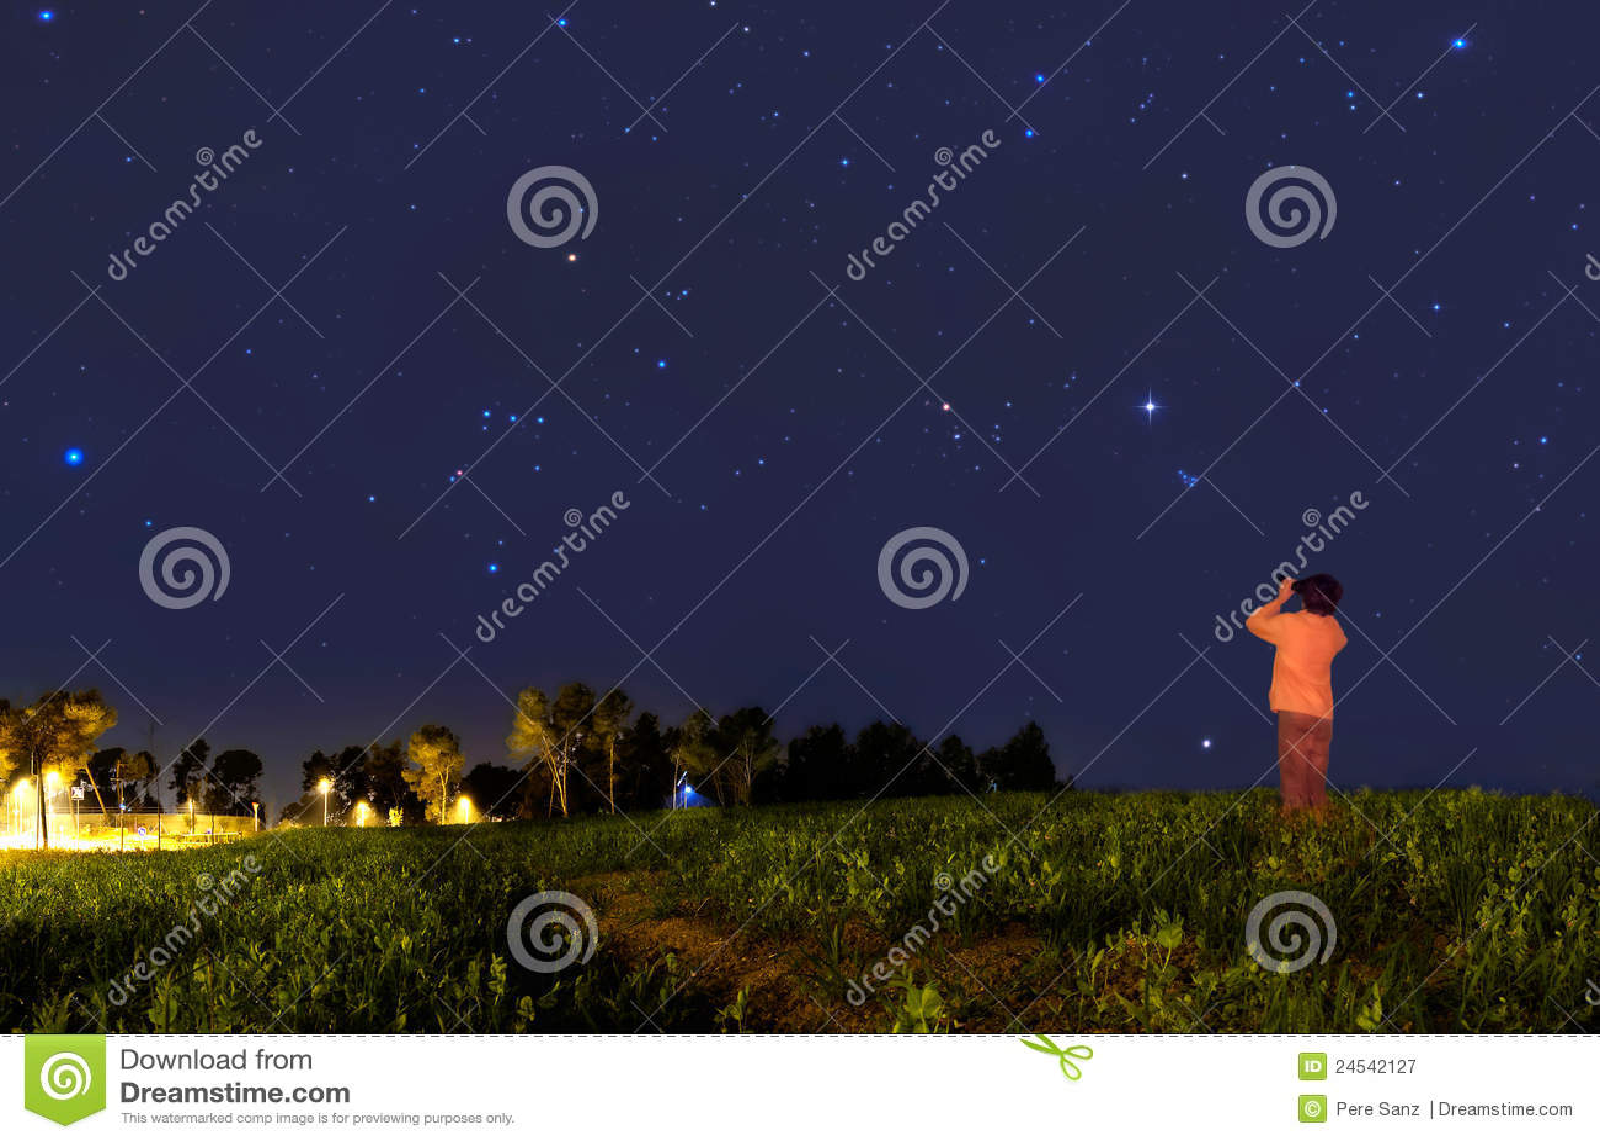 Kid looking at the stars